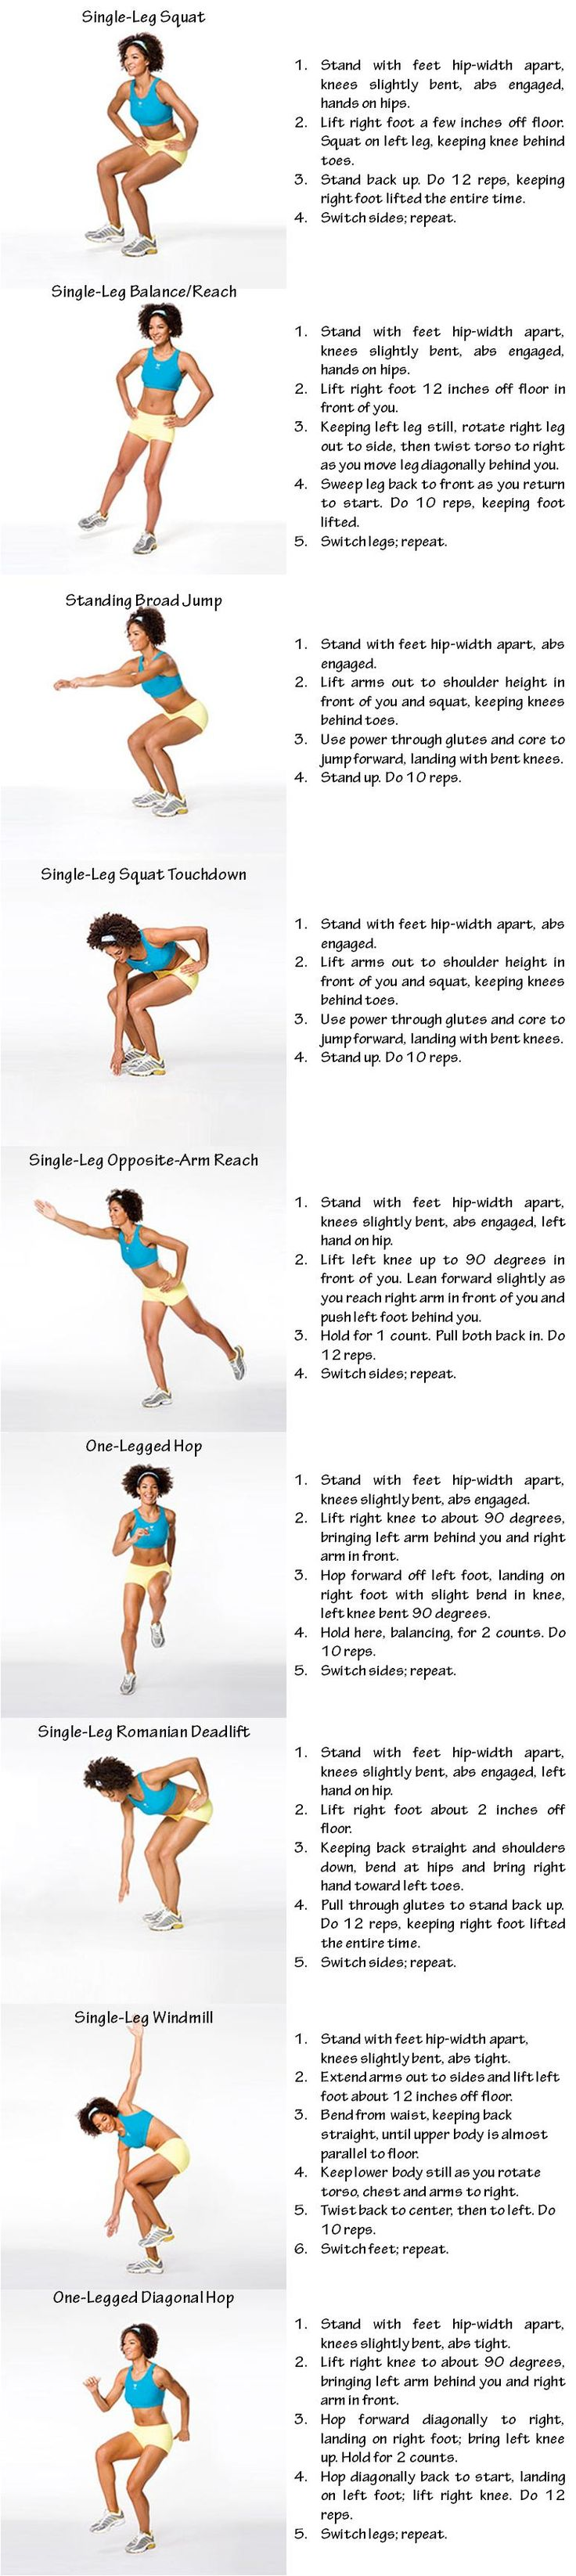 www.gymra.com/... #fitness#exercise #weightloss #diet#fitspiration #fitspo #health